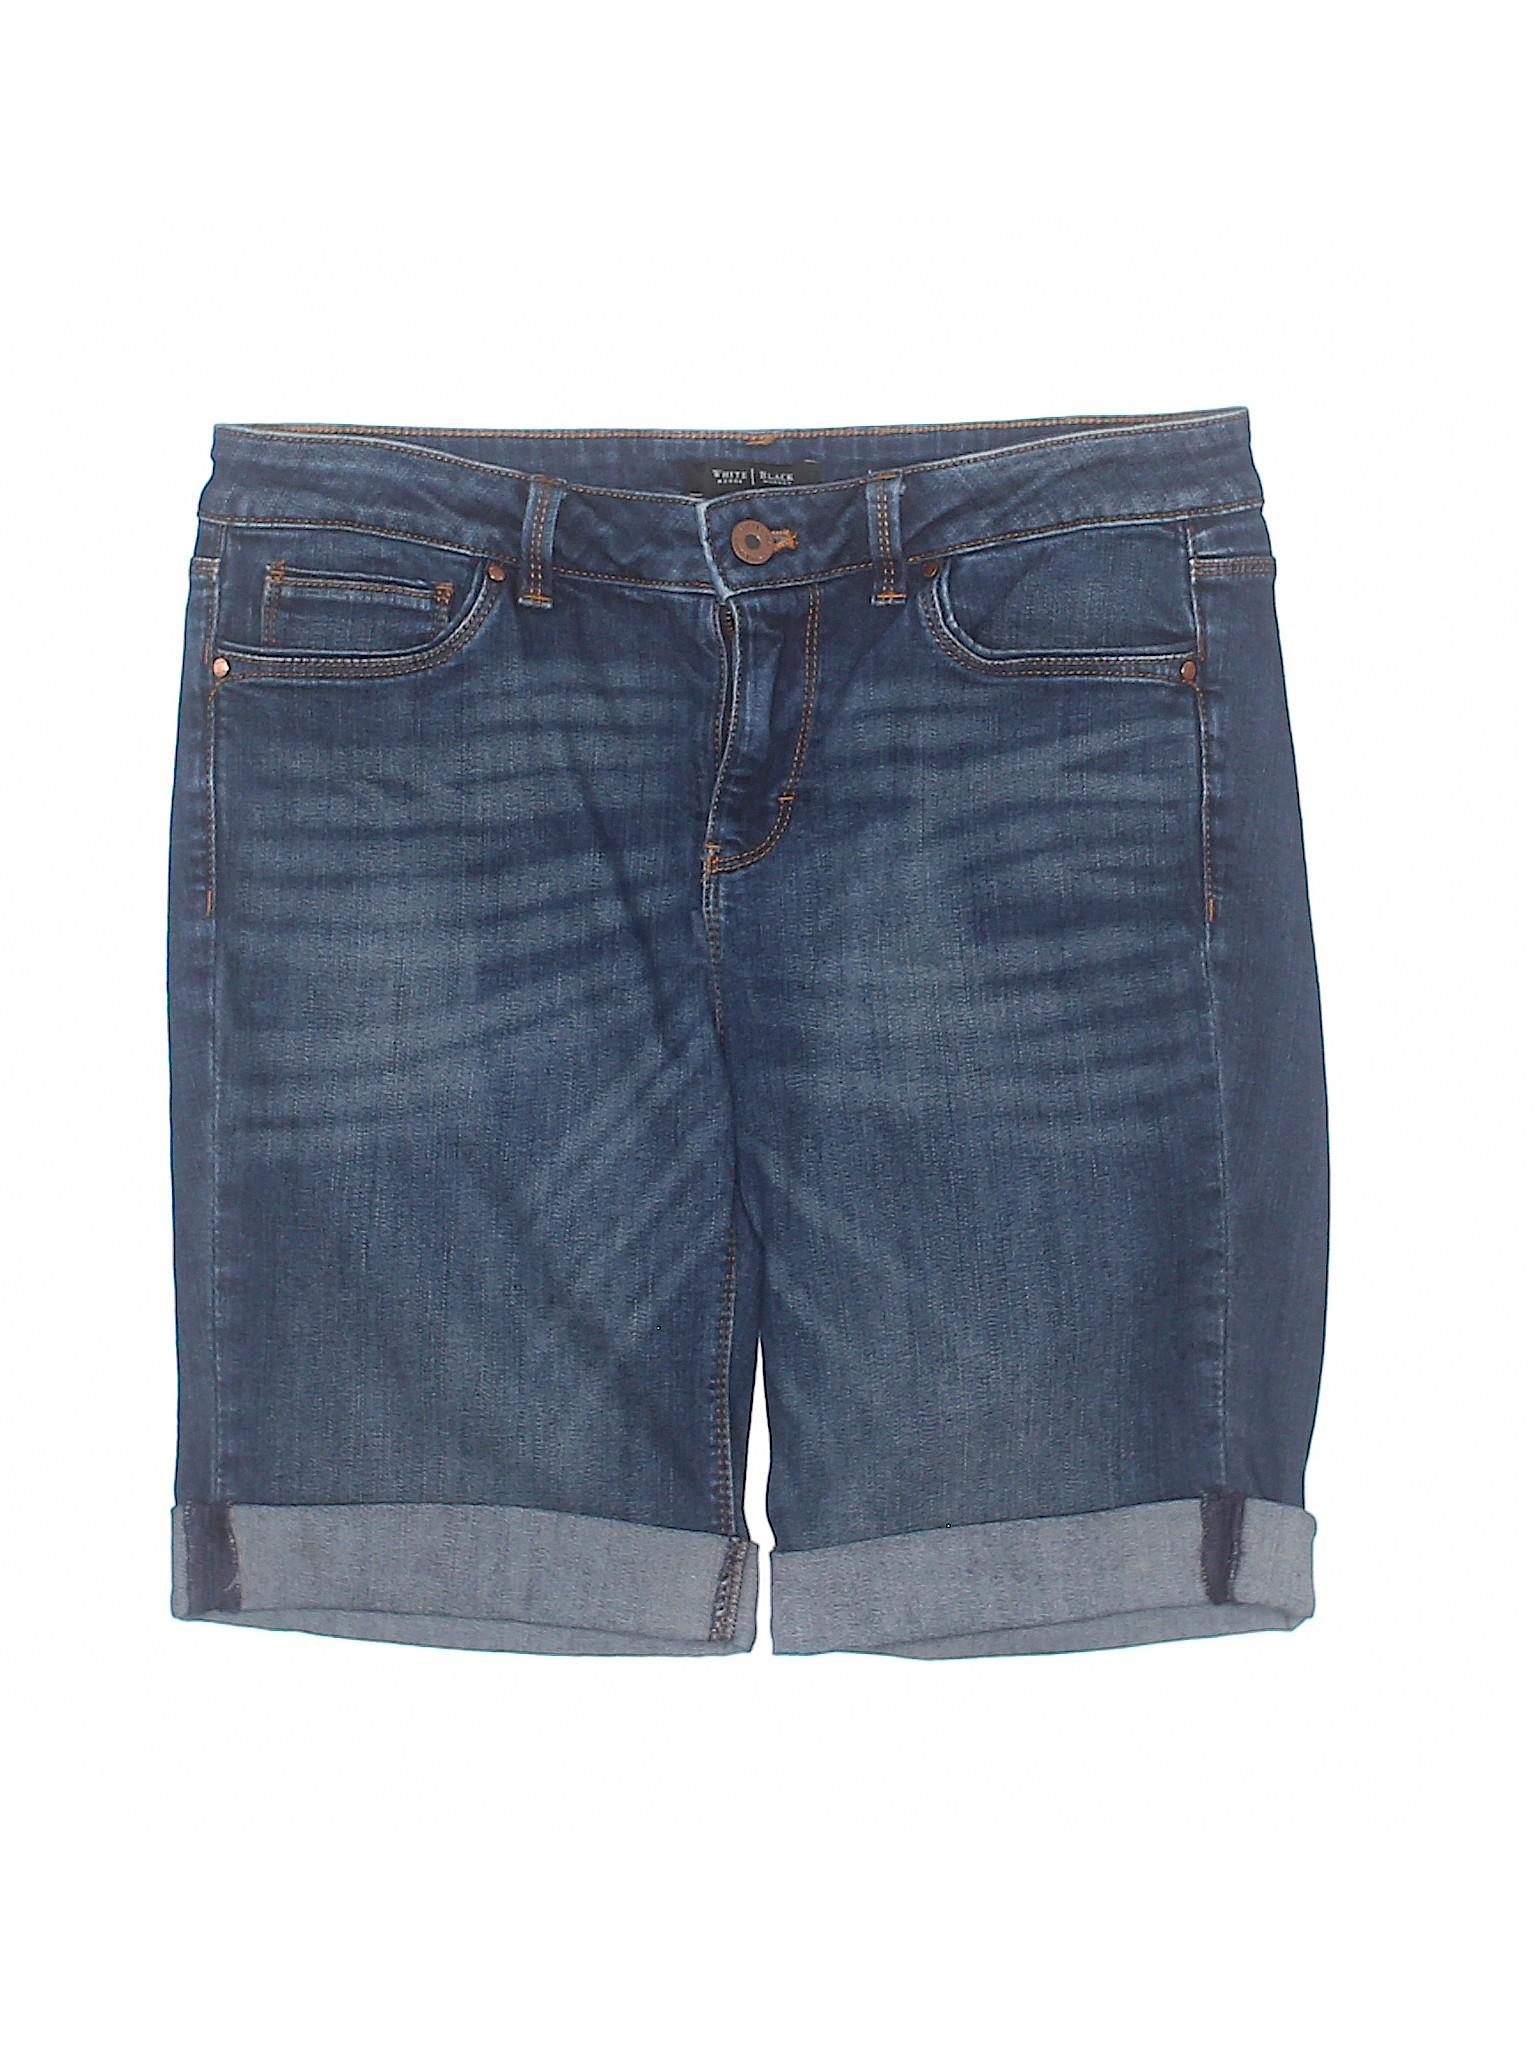 Denim Shorts Boutique House Black White Market vgqZT8x